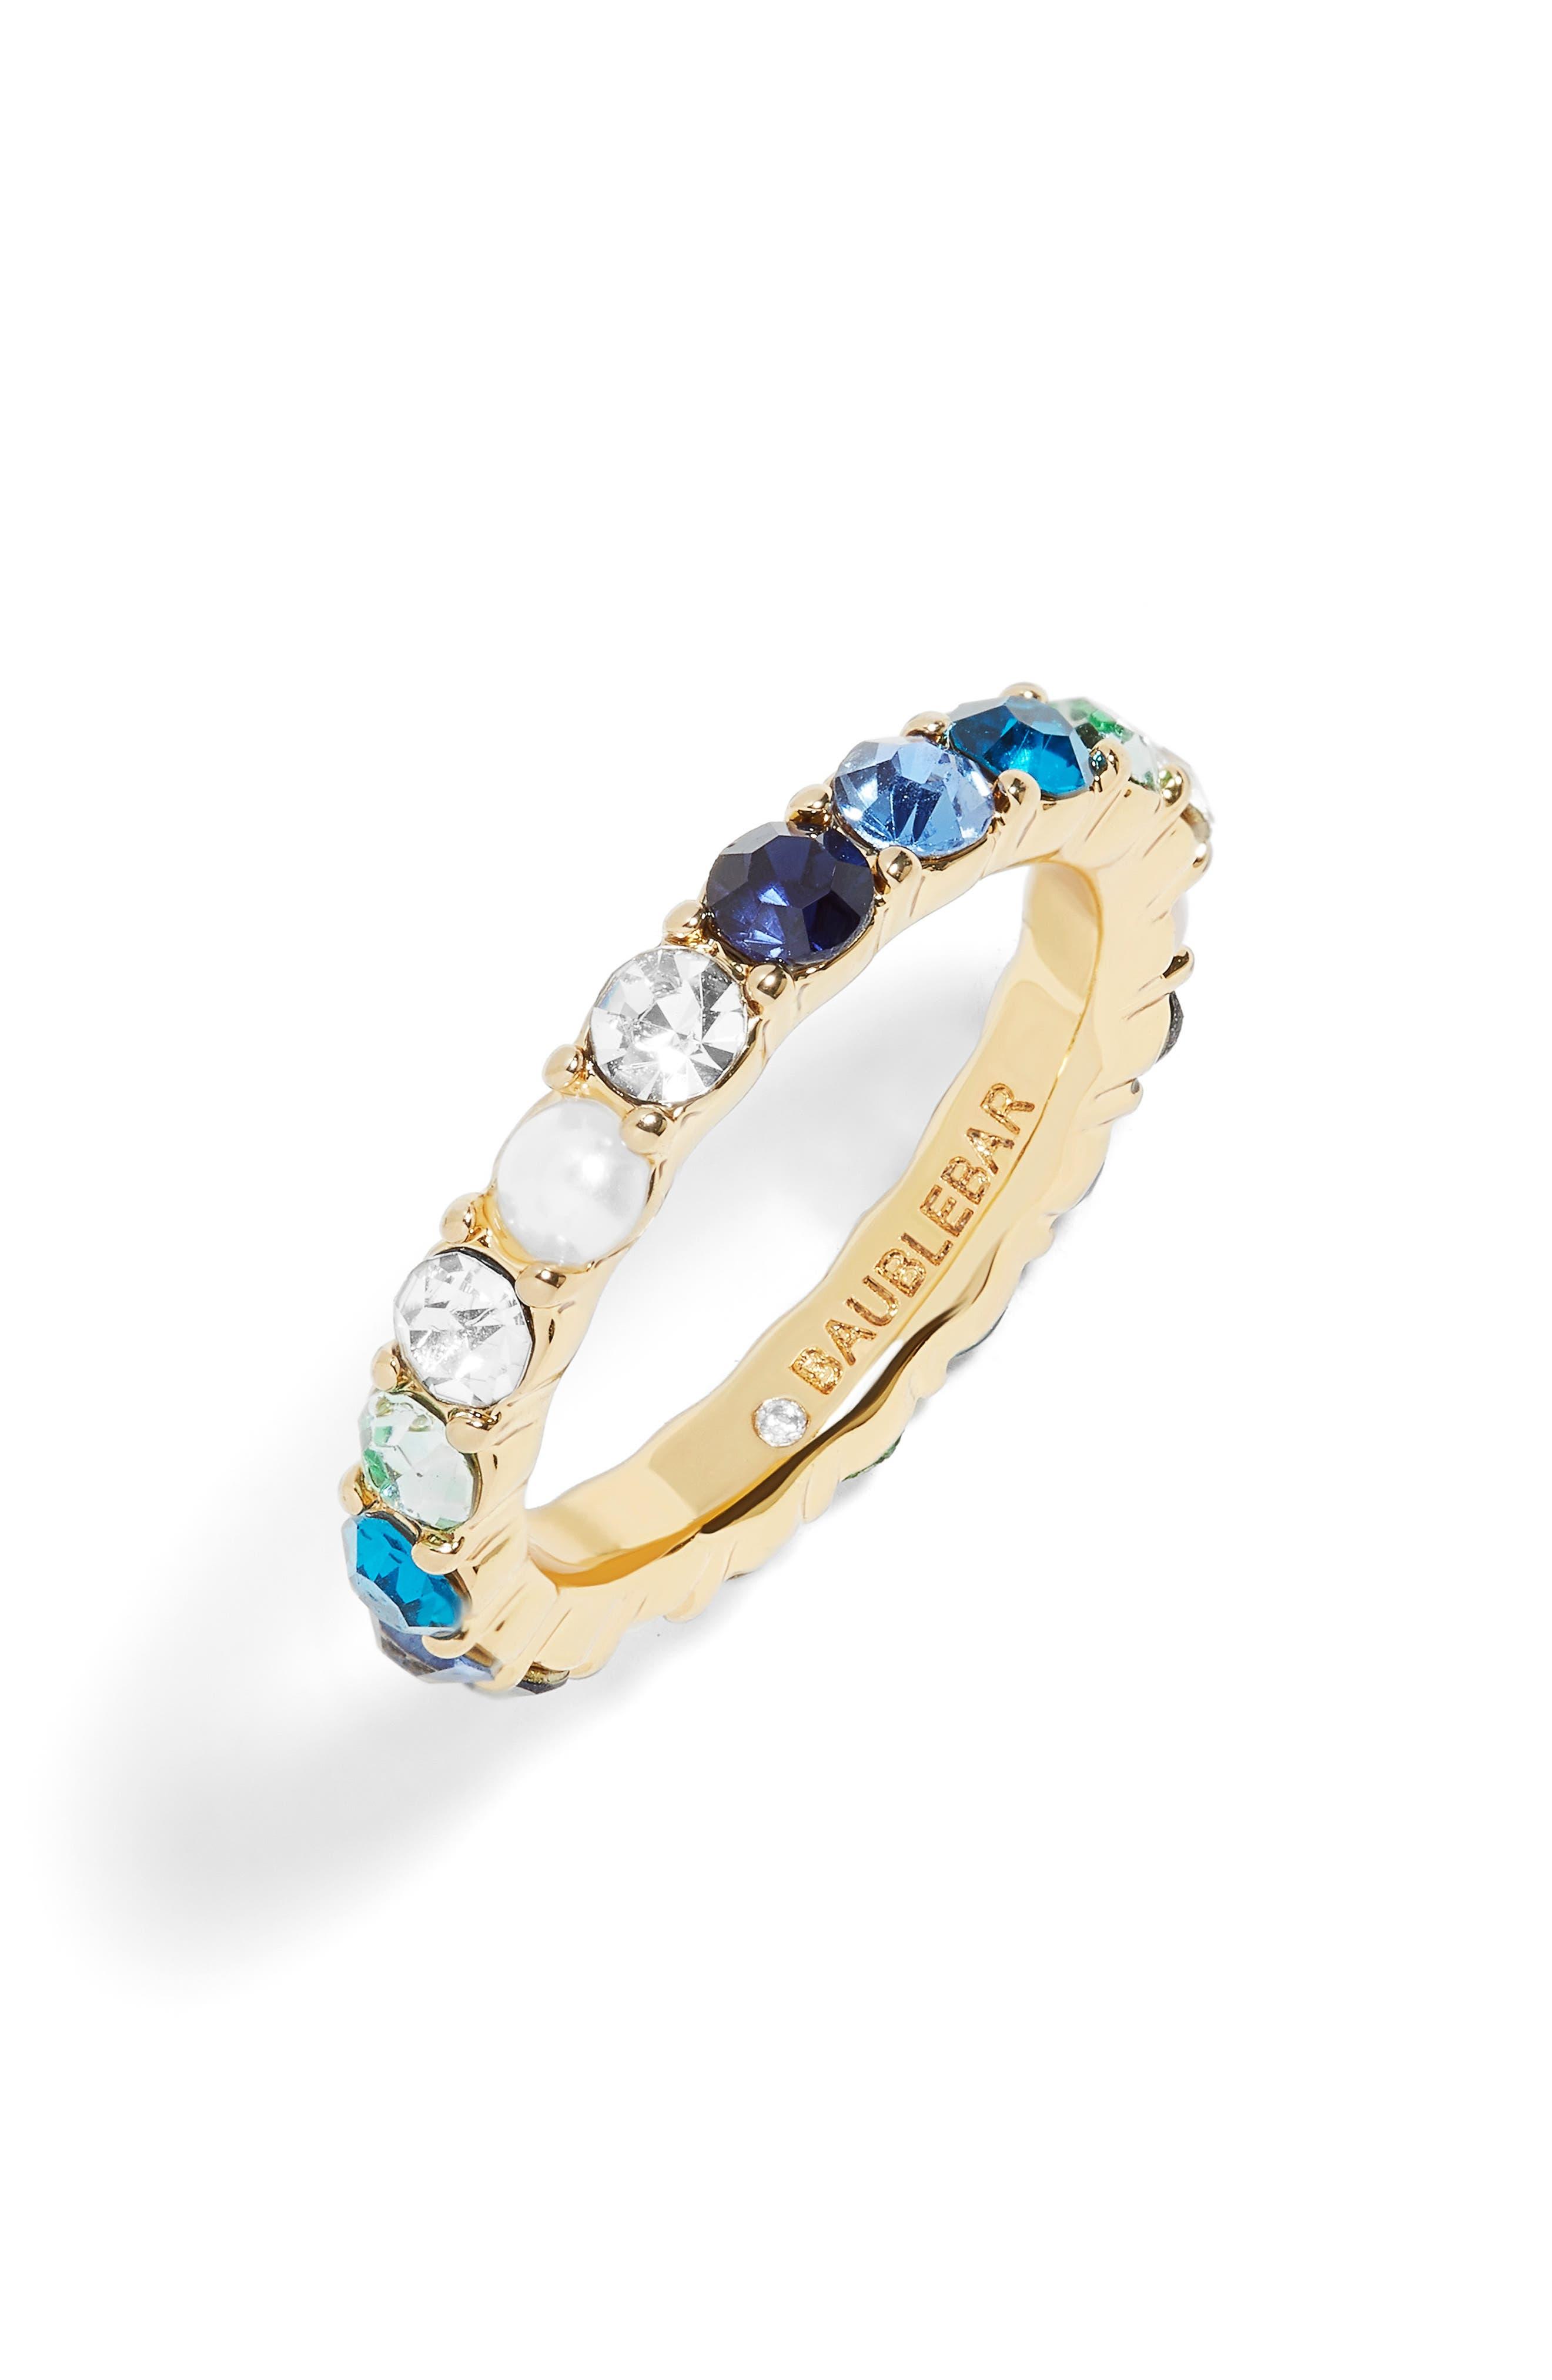 x Micaela Erlanger 7 Days a Week Eternity Ring,                             Main thumbnail 1, color,                             BLUE/ GOLD